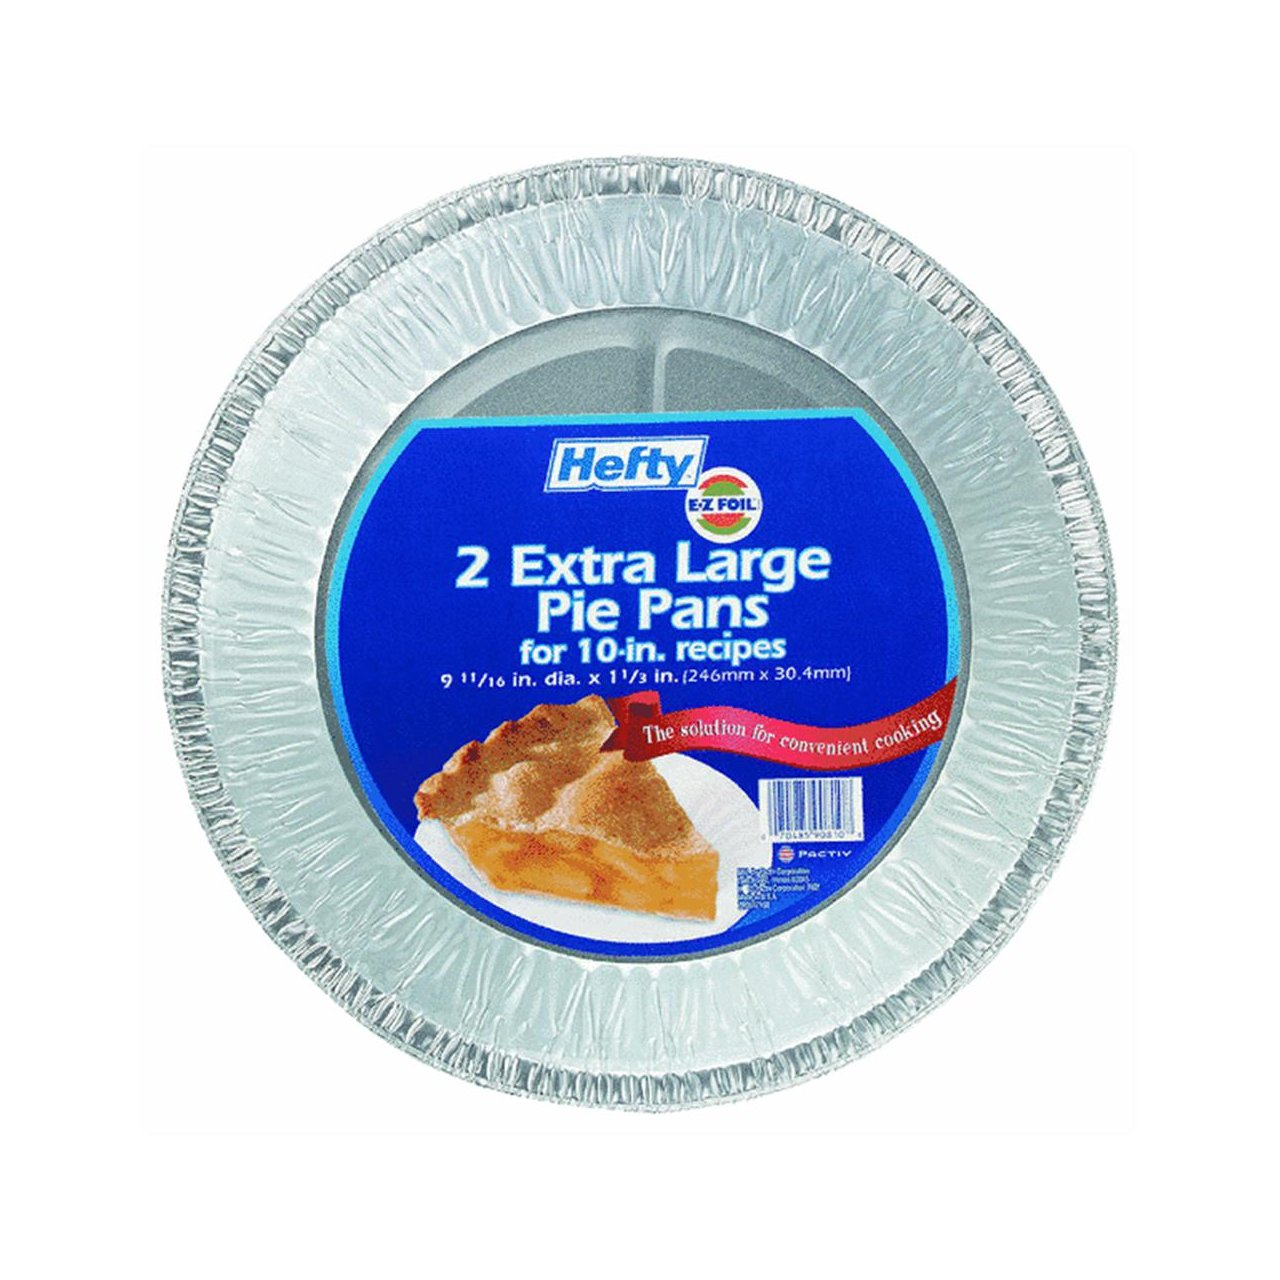 Amazon.com Pactiv/E Z Foil 90810 Extra Large Pie Pan (Pack of 12) Foil Pie Kitchen \u0026 Dining  sc 1 st  Amazon.com & Amazon.com: Pactiv/E Z Foil 90810 Extra Large Pie Pan (Pack of 12 ...